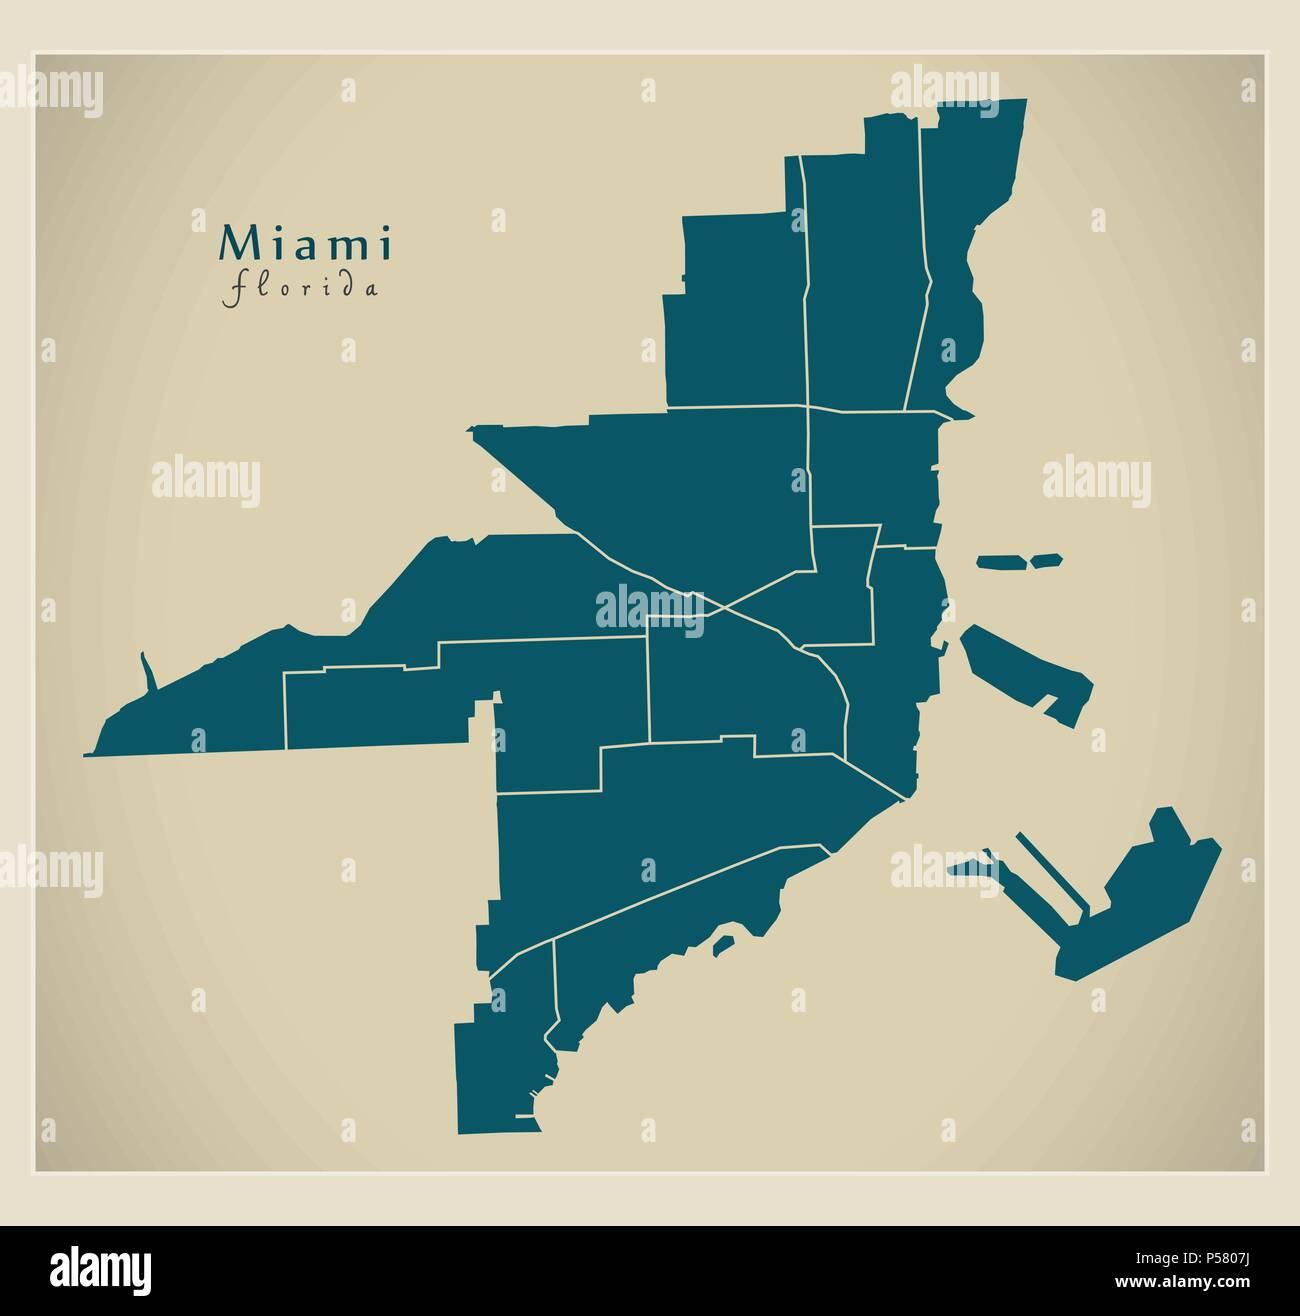 Map Of Miami Florida.Modern City Map Miami Florida City Of The Usa With Neighborhoods